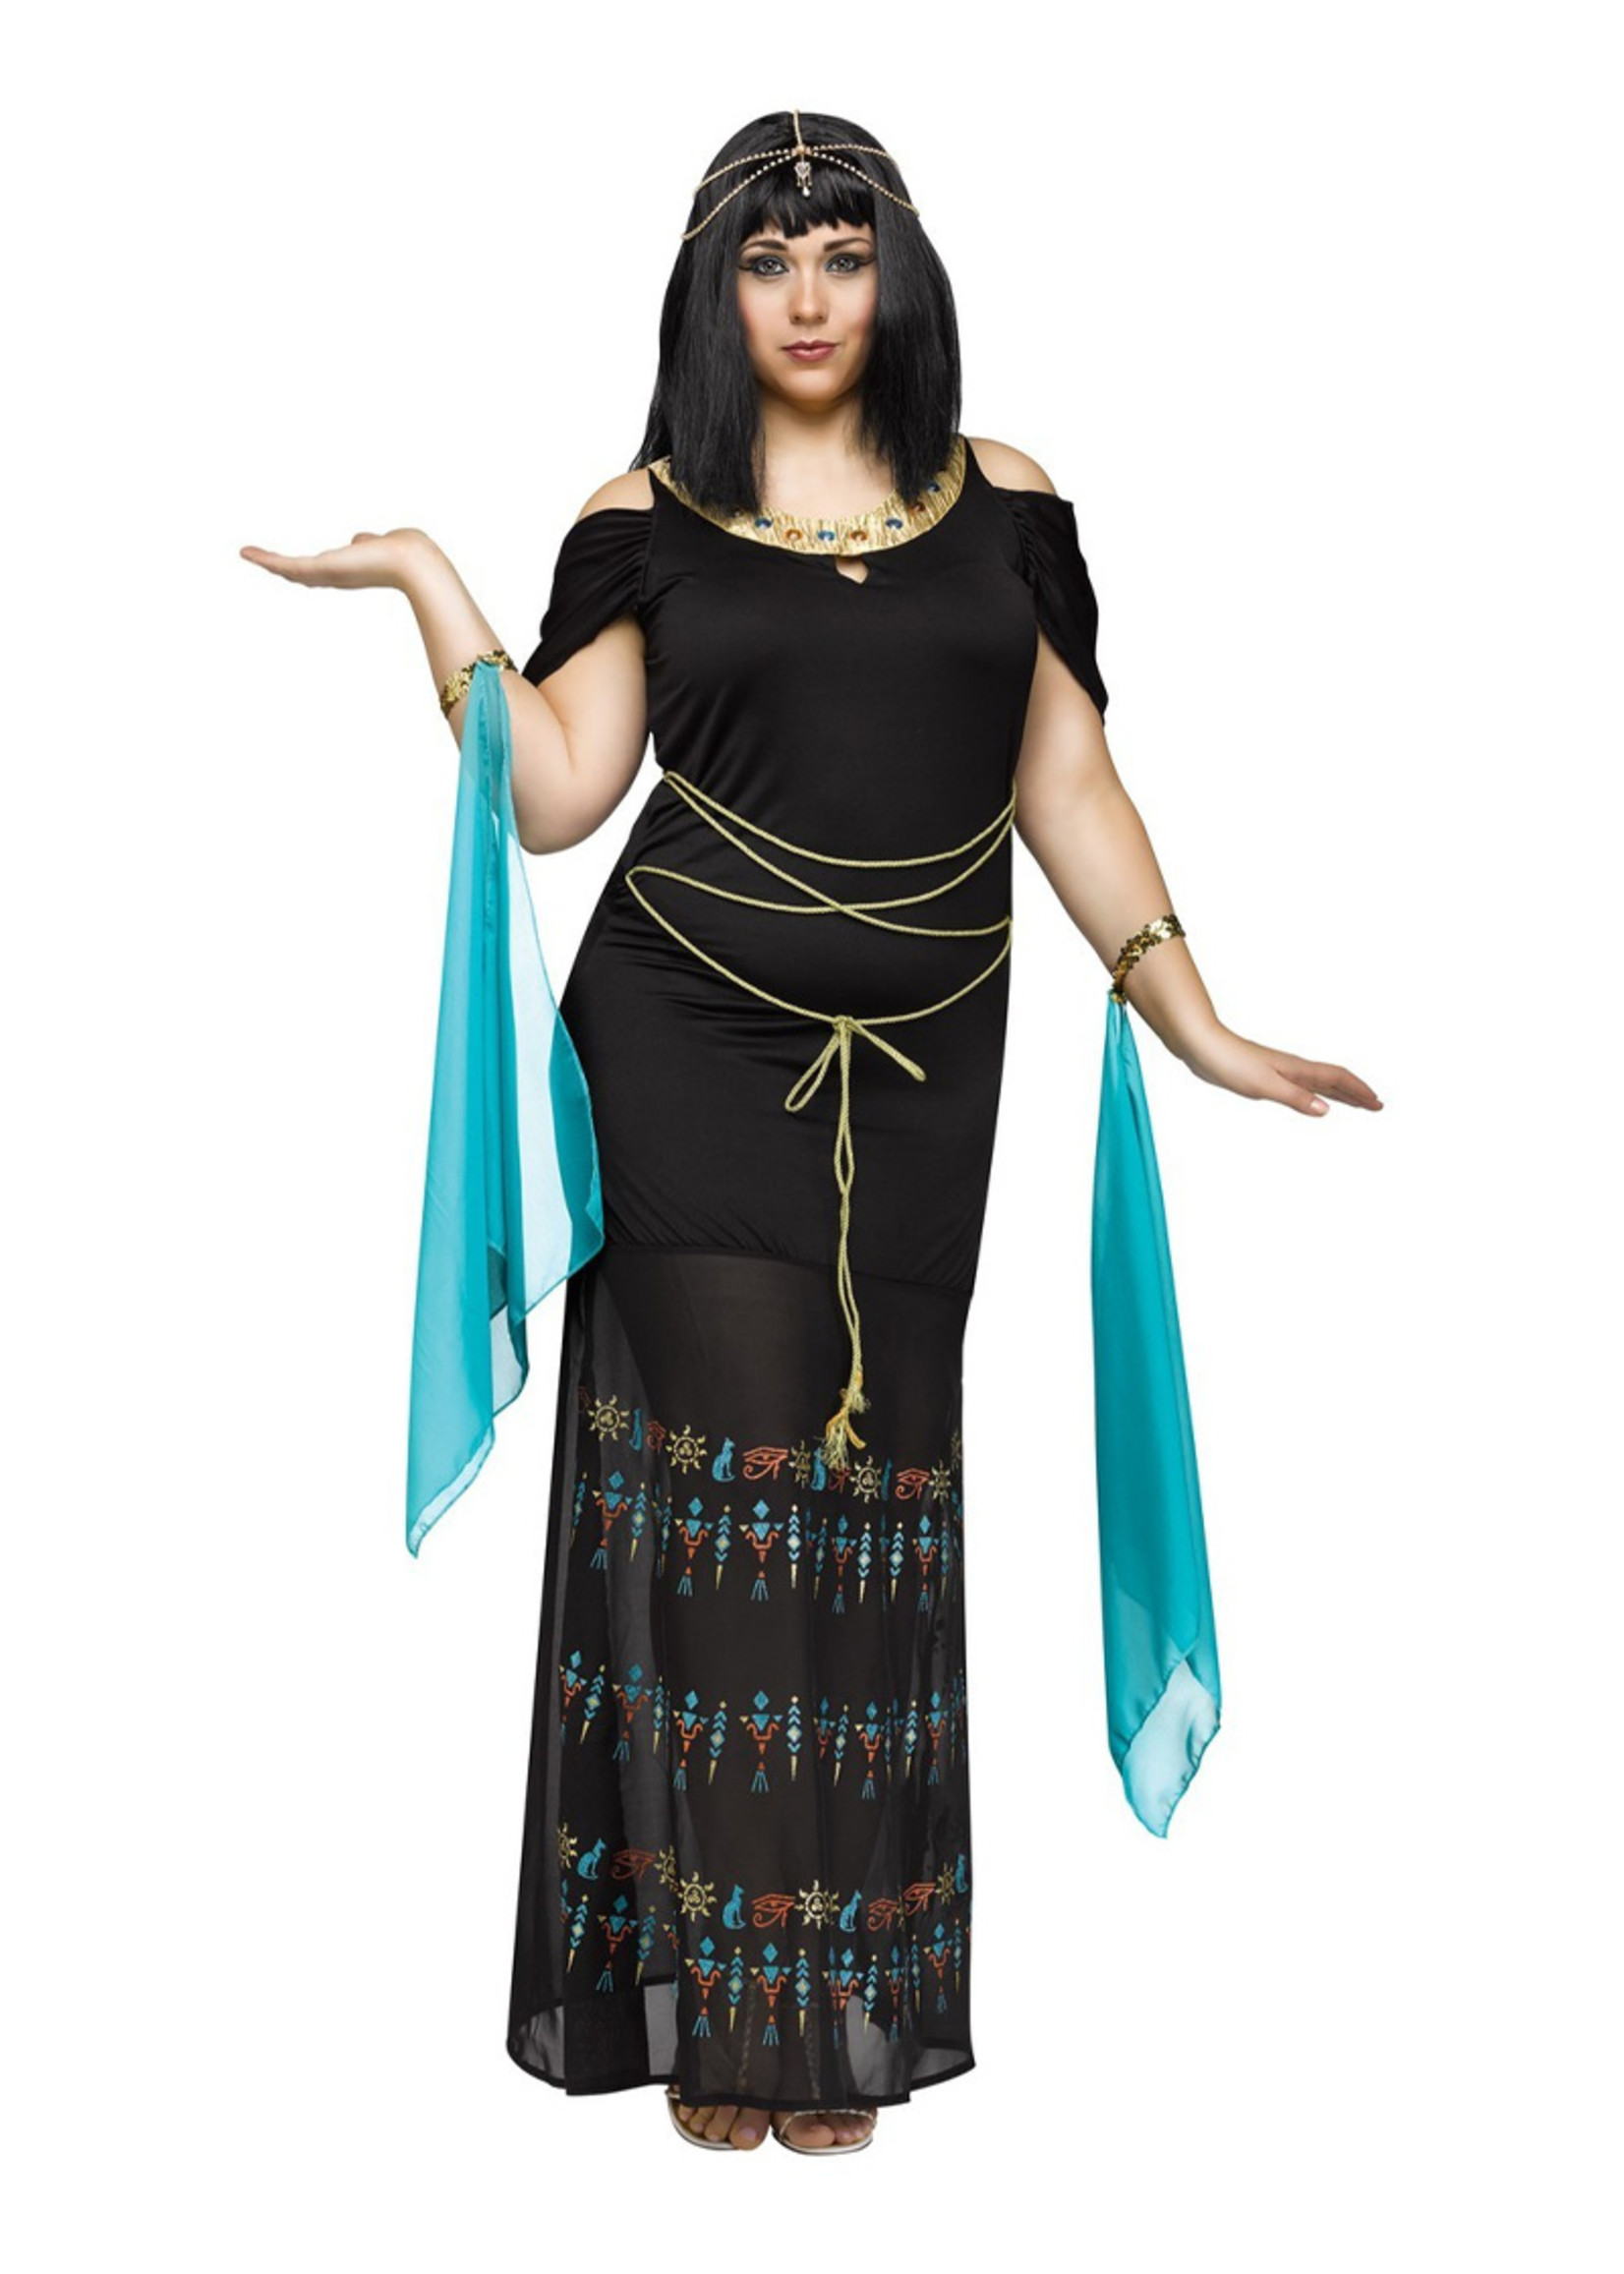 Egyptian Queen Costume - Women Plus